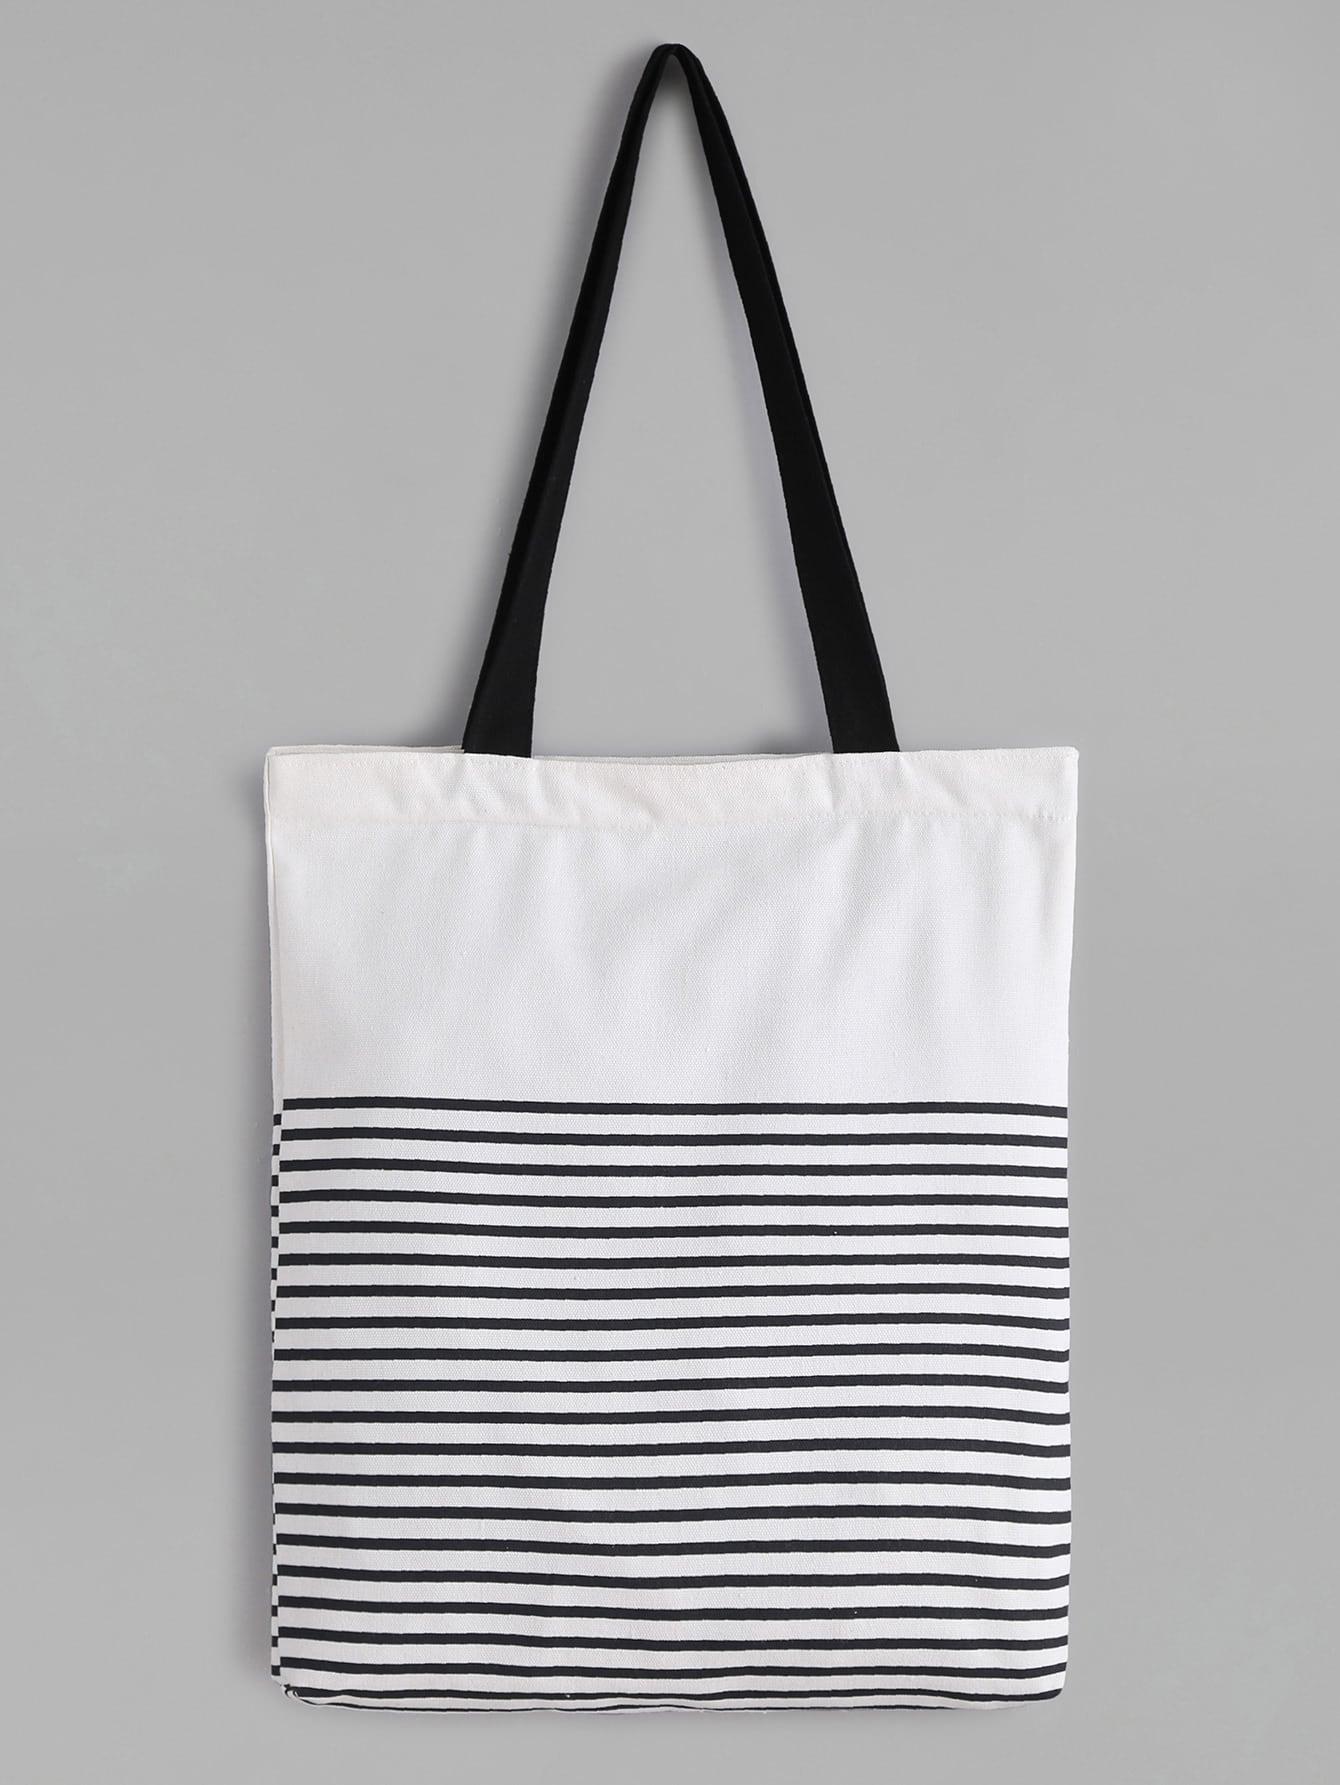 White Striped Canvas Tote Bag With Black Strap -SheIn(Sheinside)